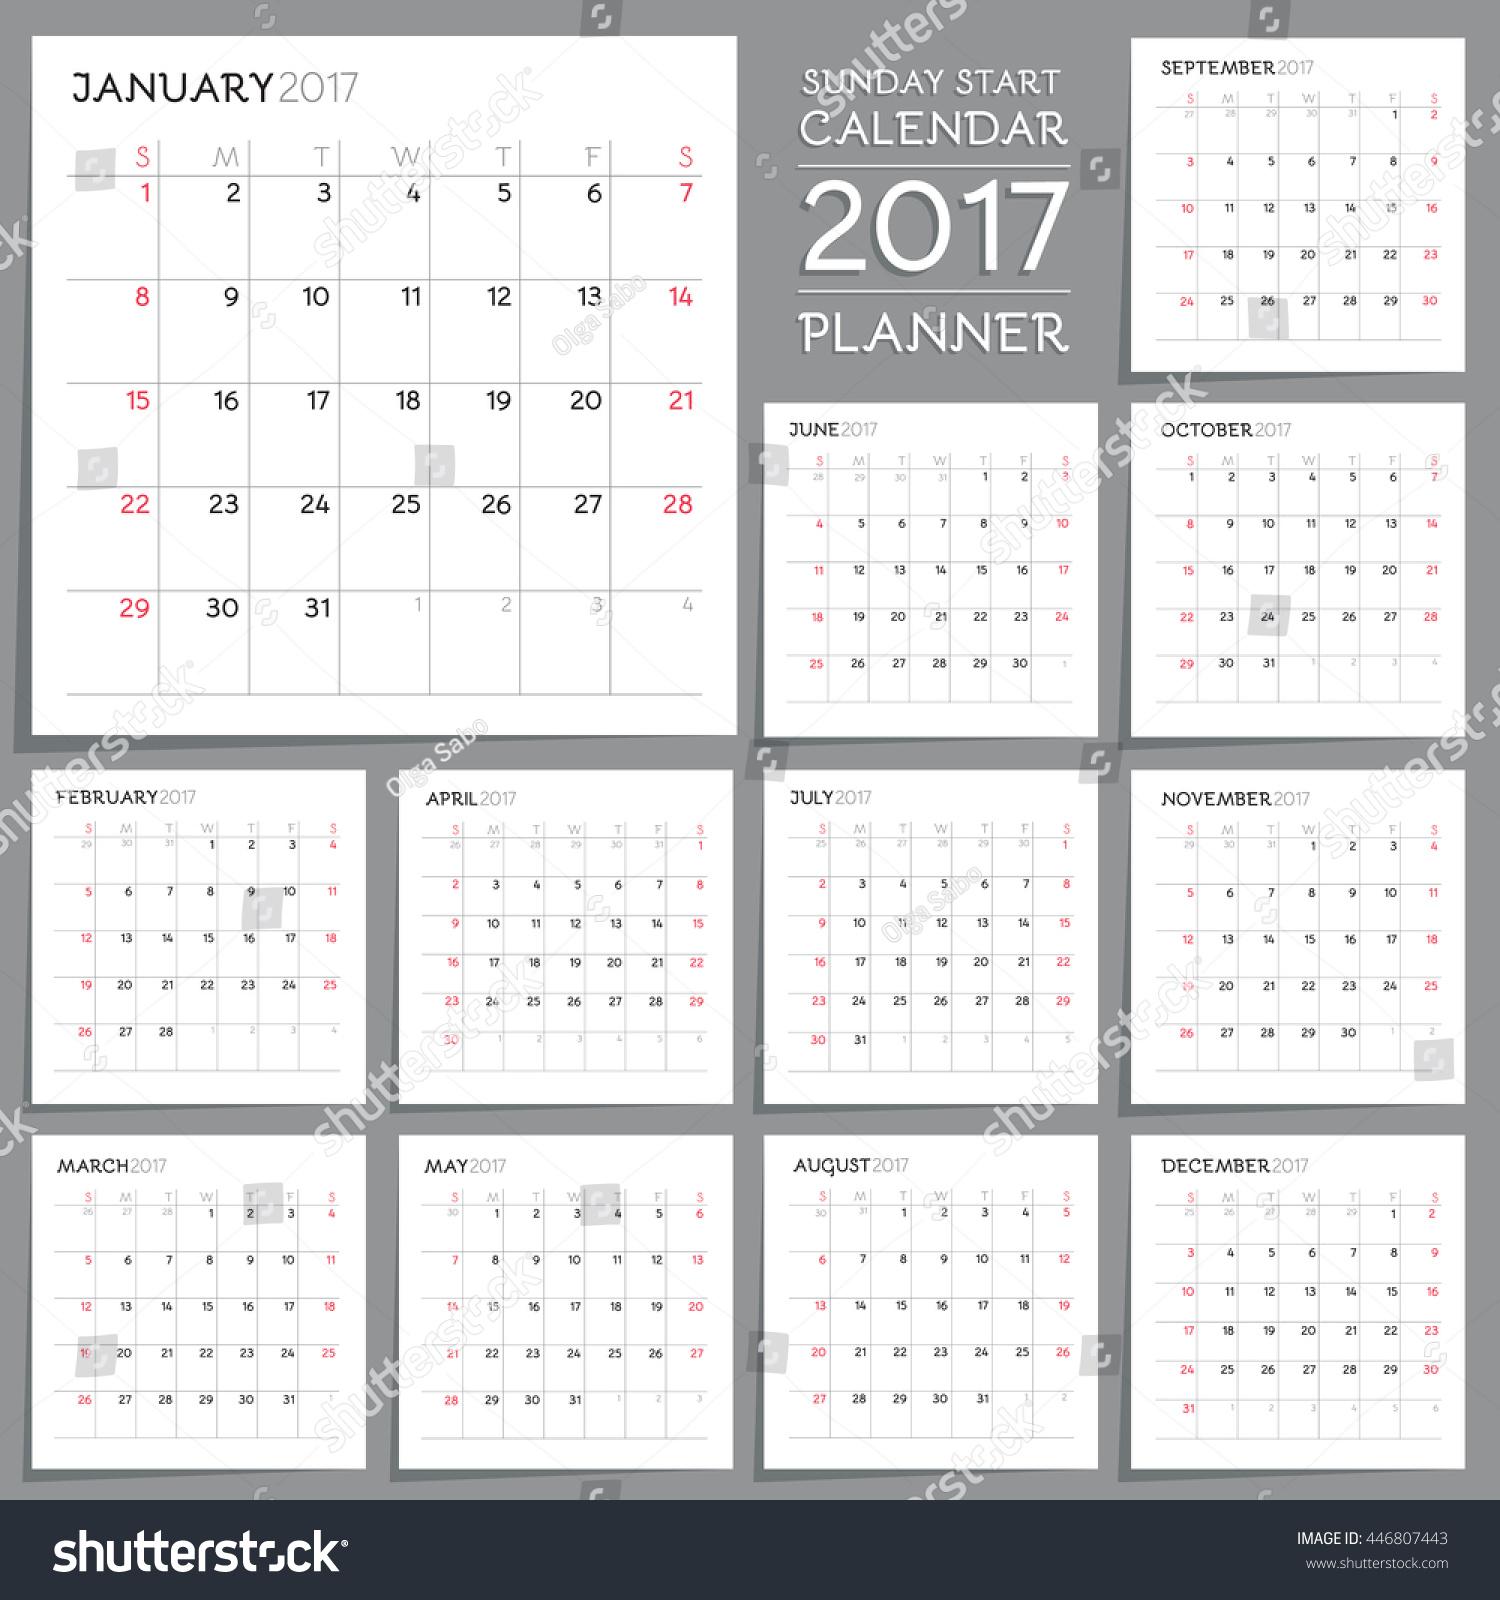 Planner Style Calendar Template : Calendar planner design week starts stock vector